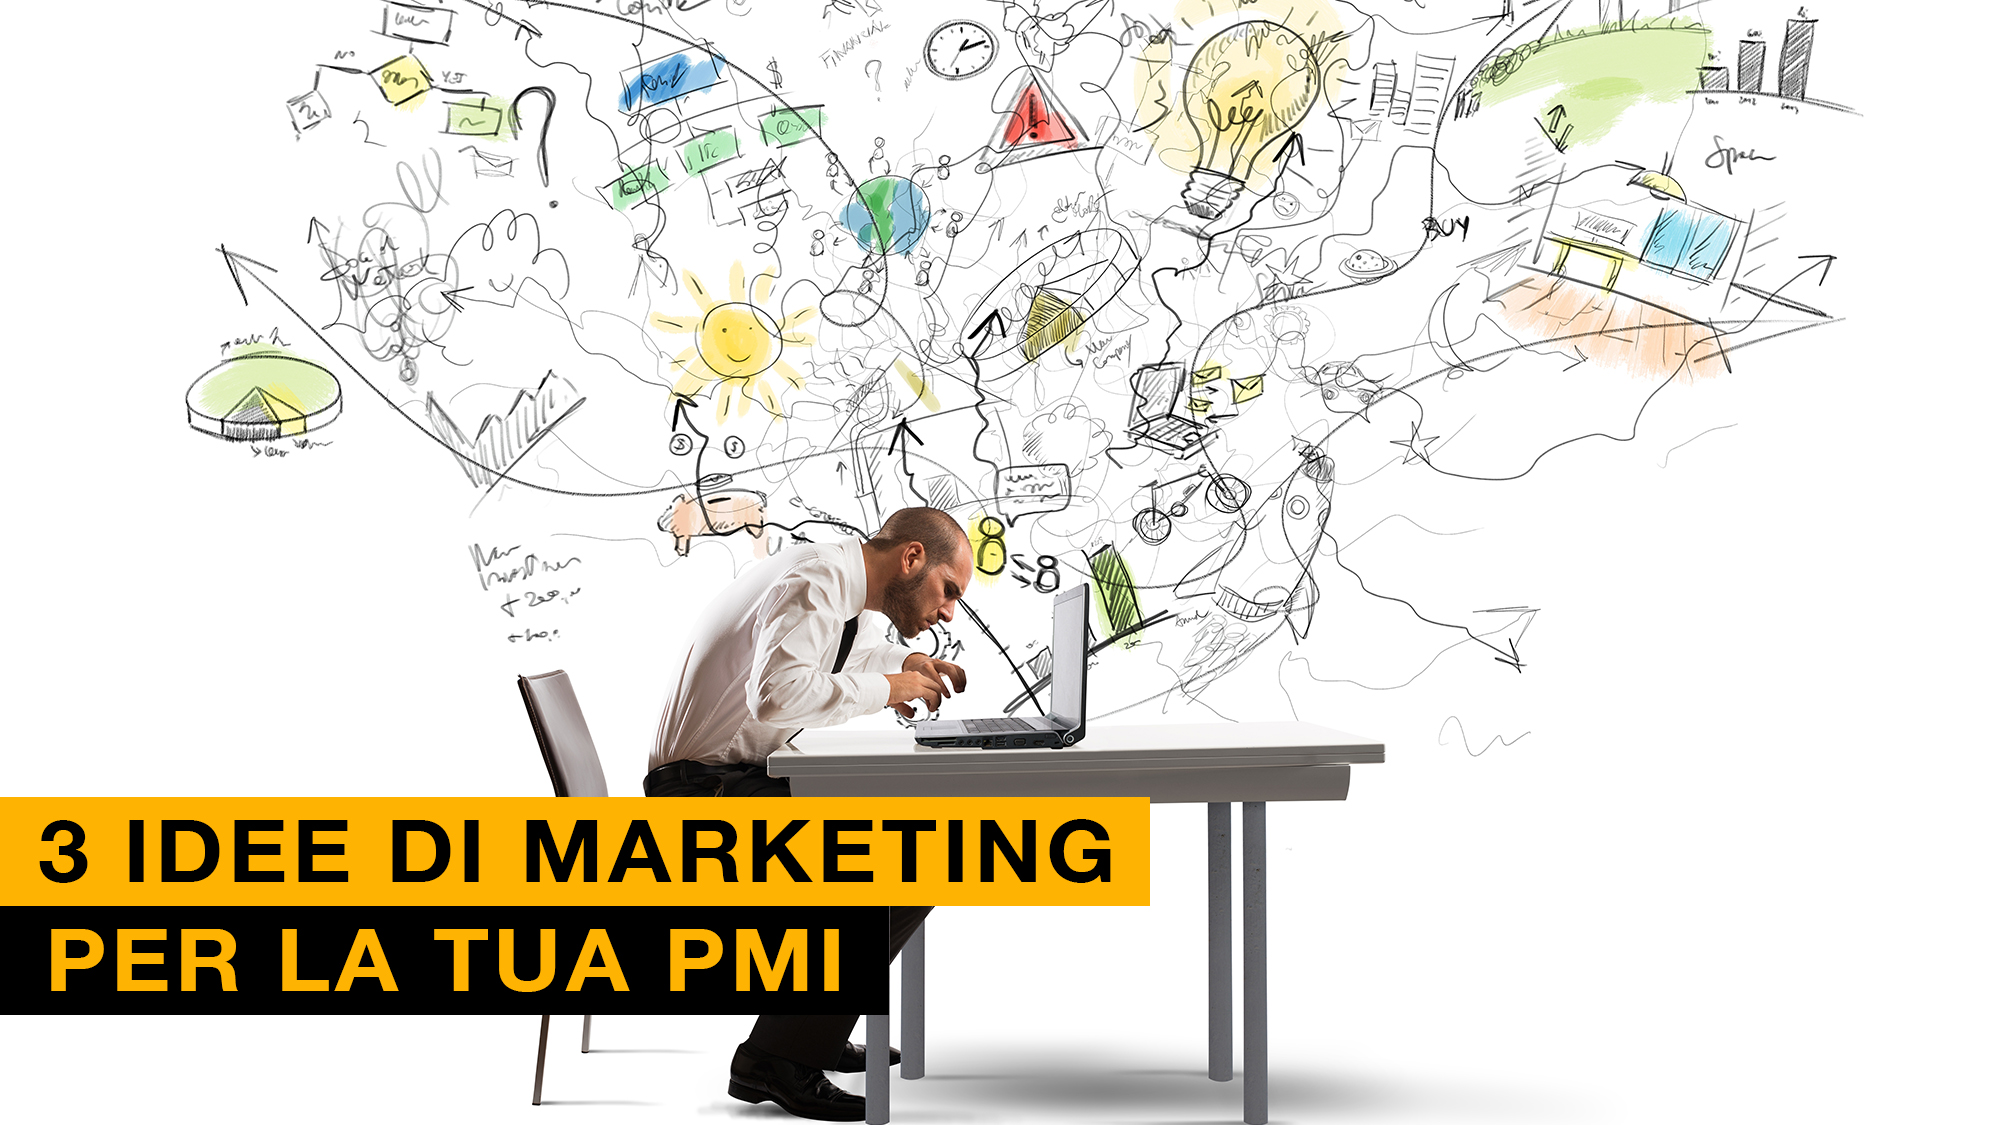 PMI Marketing